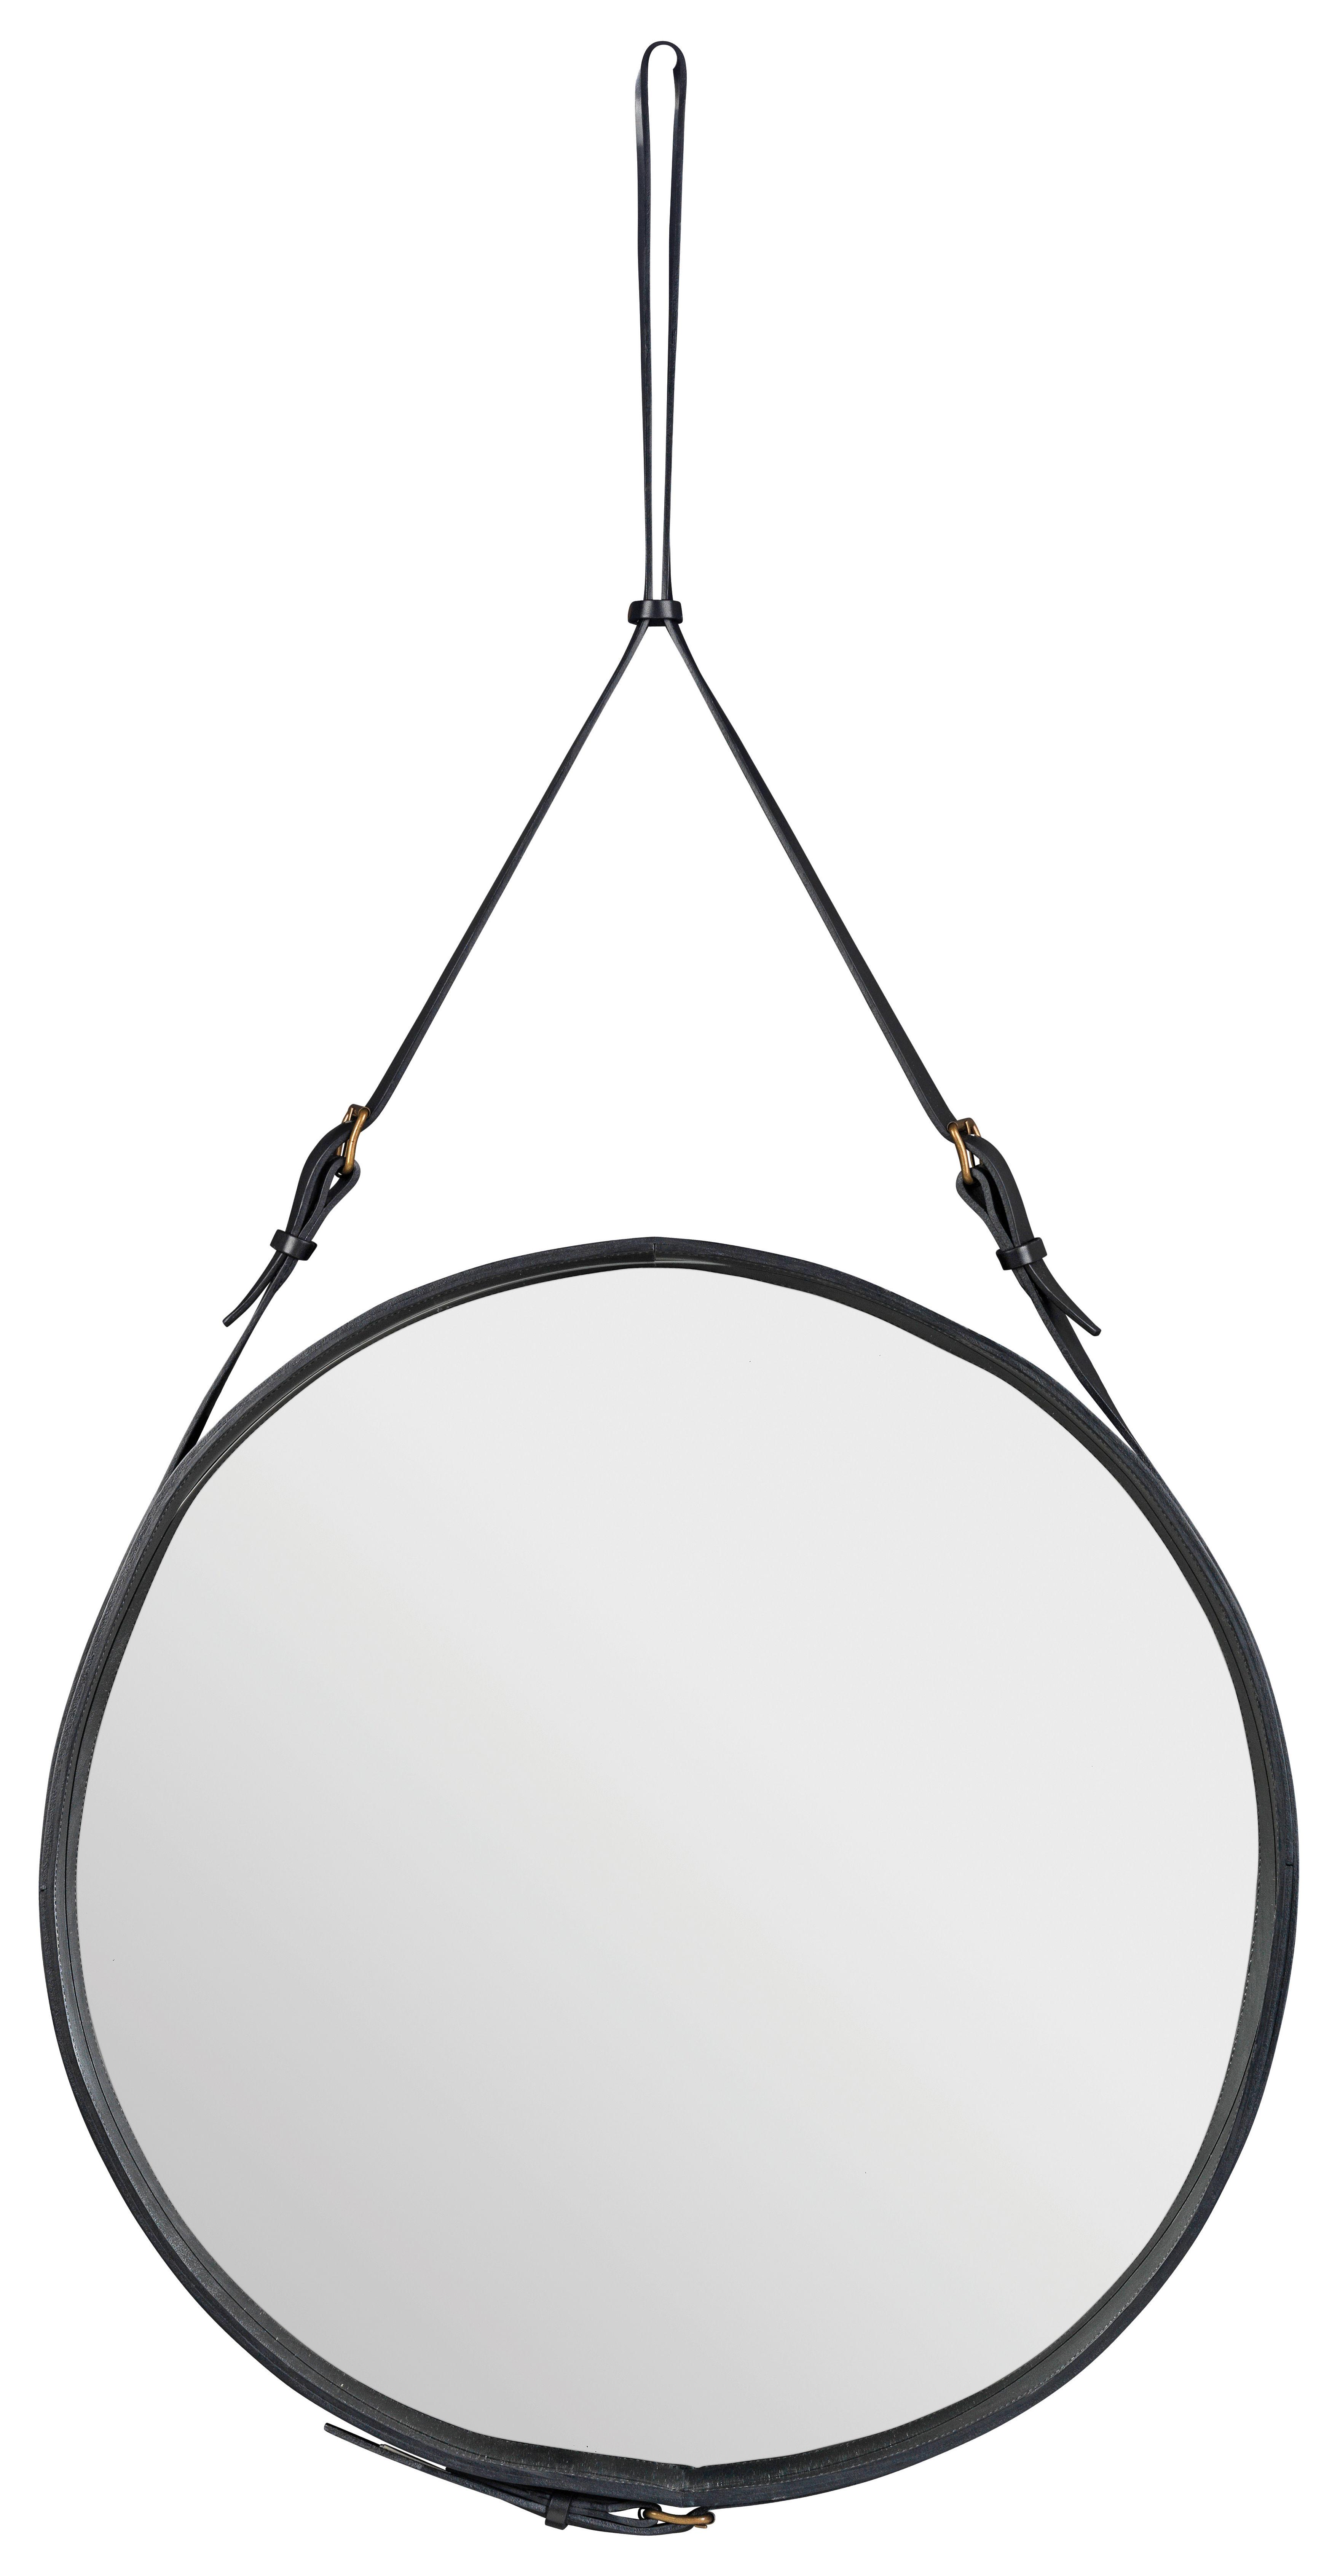 Furniture - Mirrors - Adnet Wall mirror - Ø 70 cm by Gubi - Black - Leather